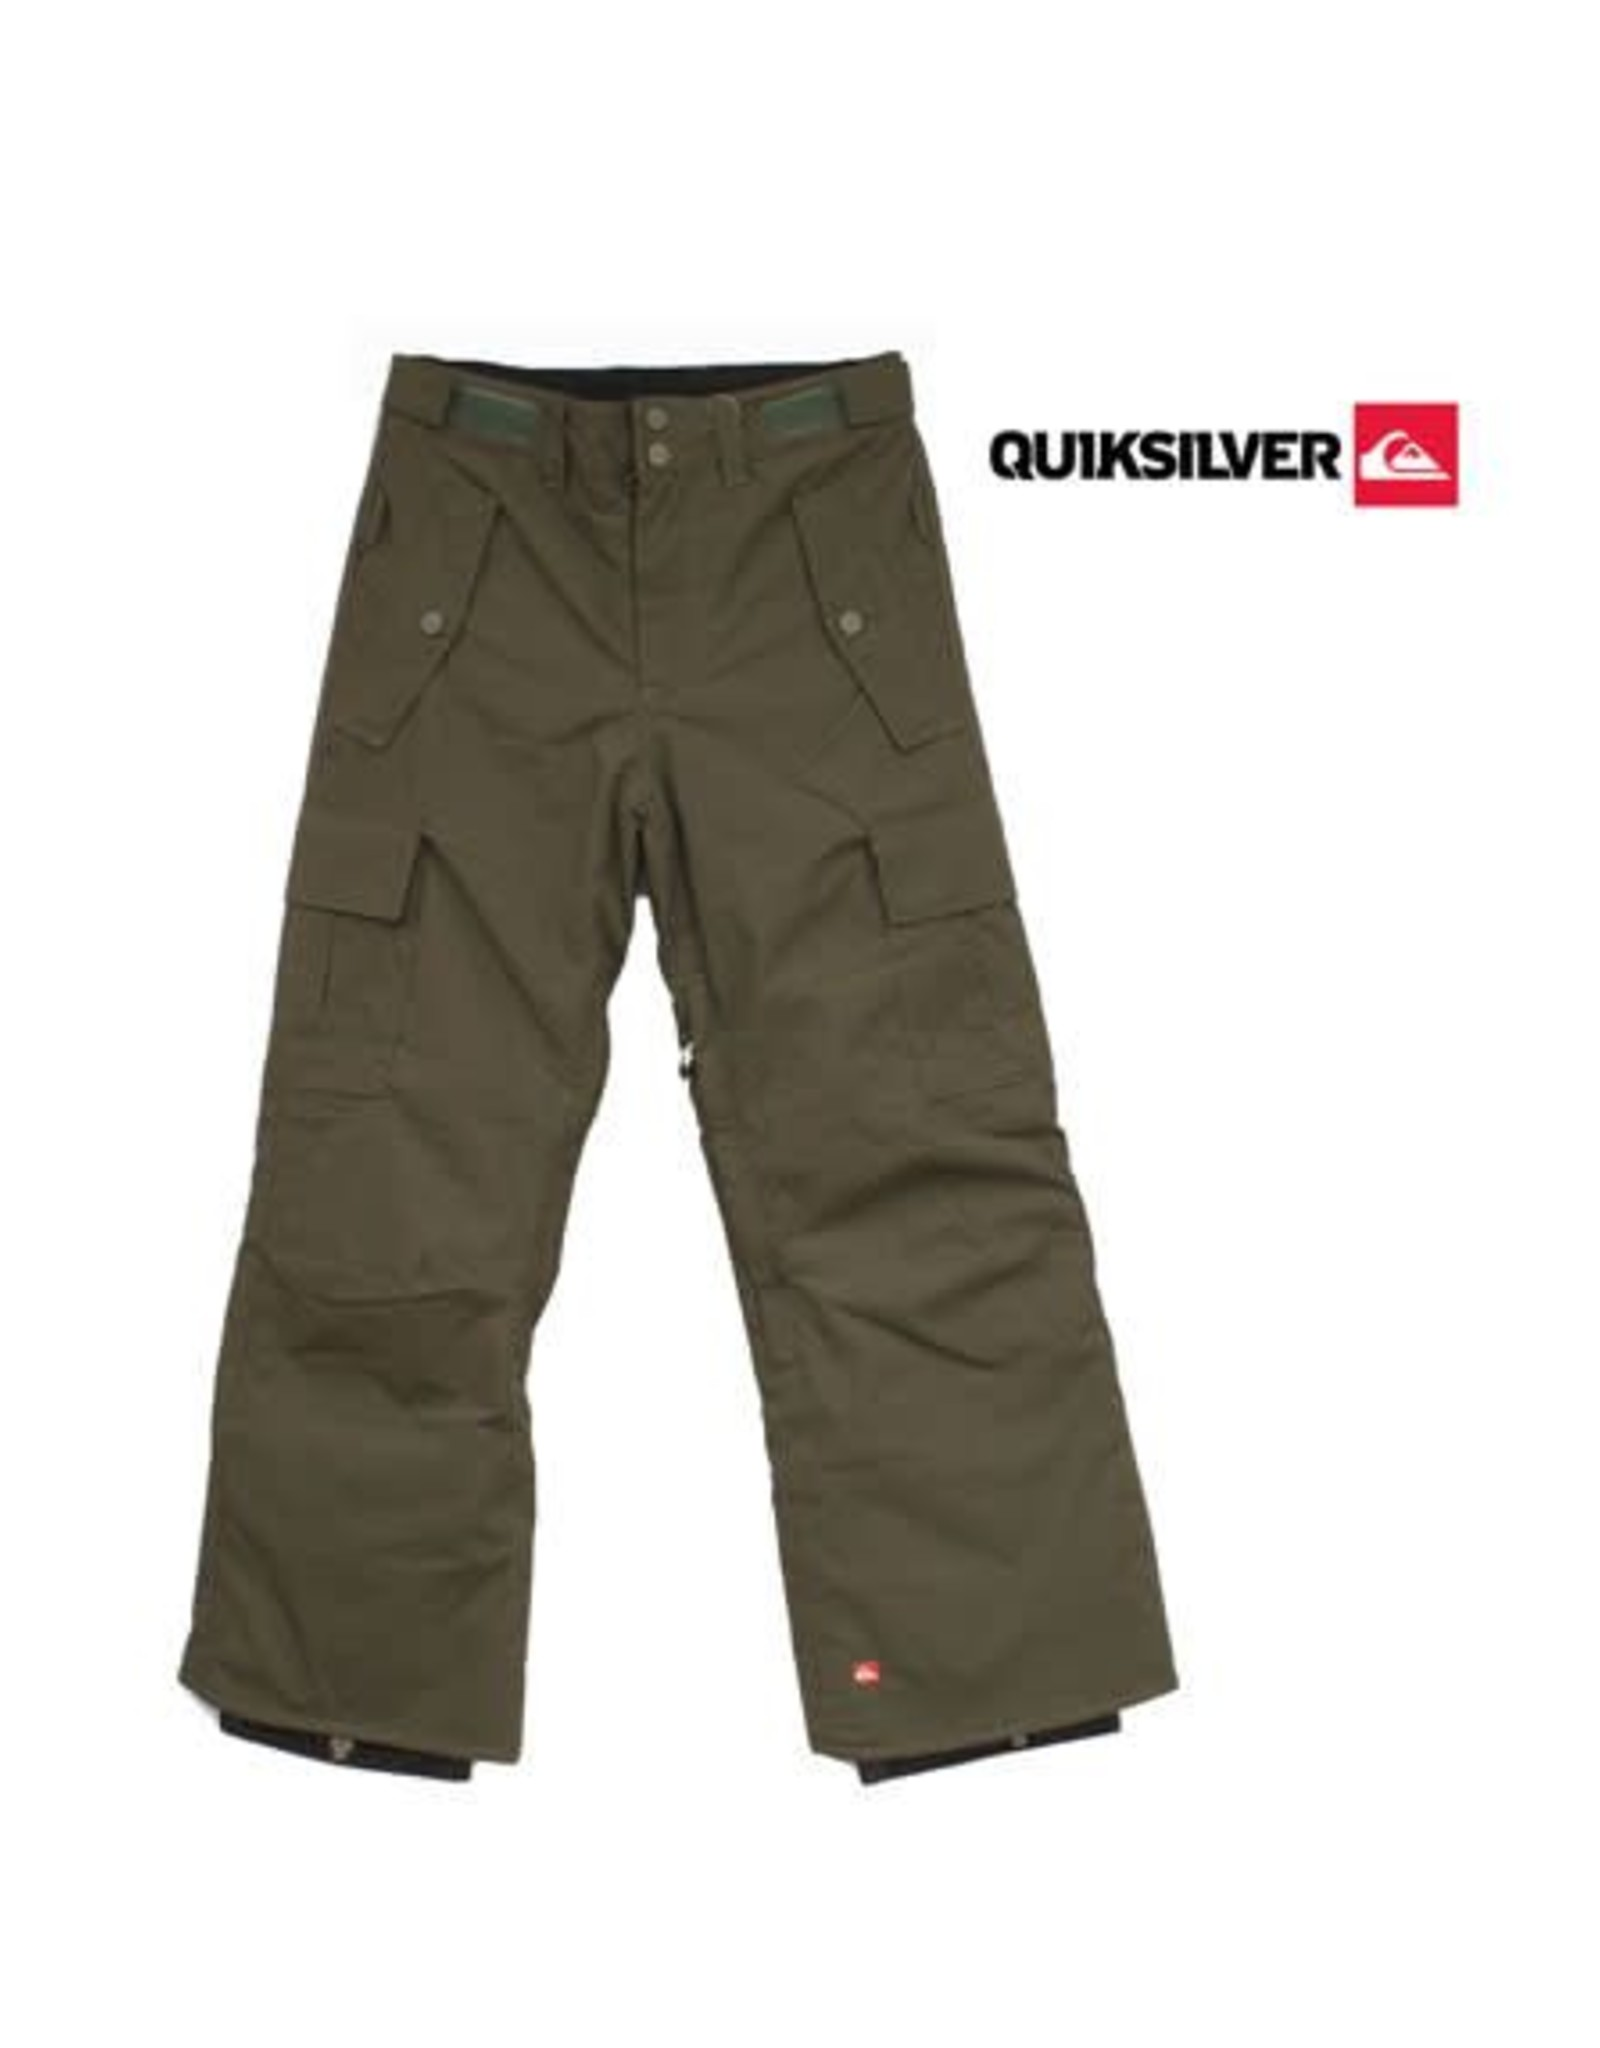 QUIKSILVER Quiksilver SKIBROEK Sherpa Youth Dark Army mt 134